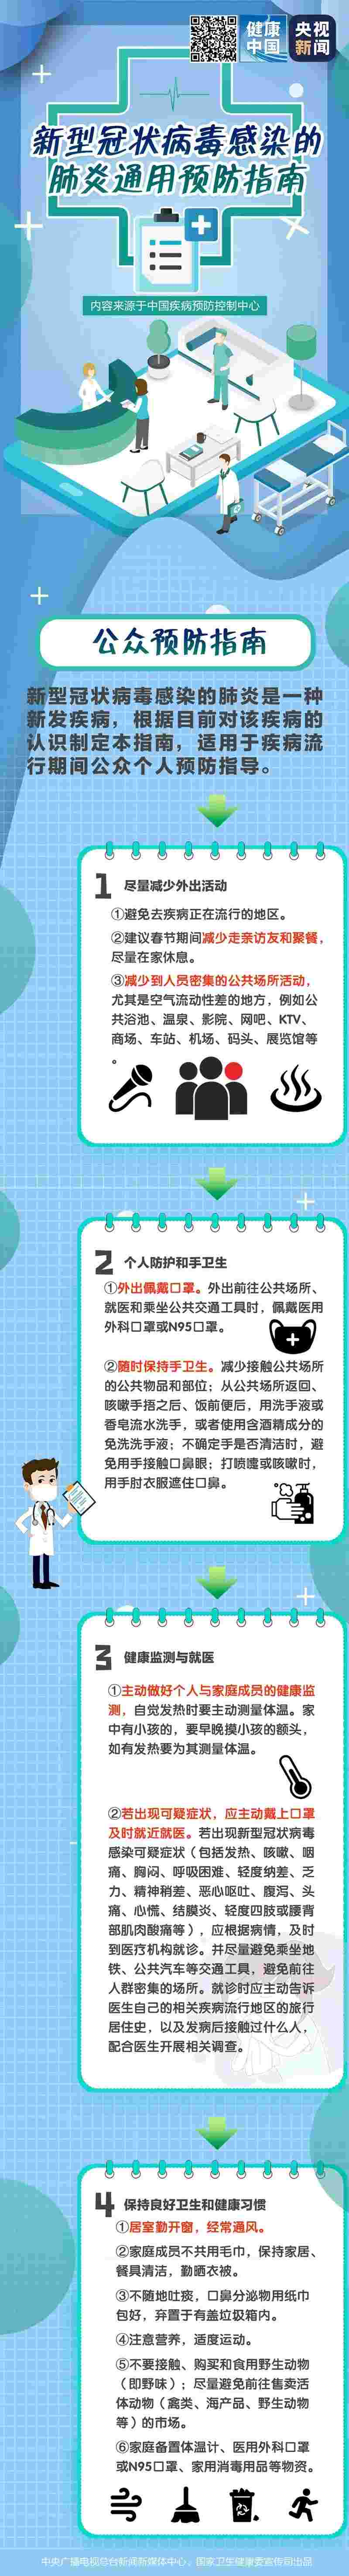 u宝app平台下载安装